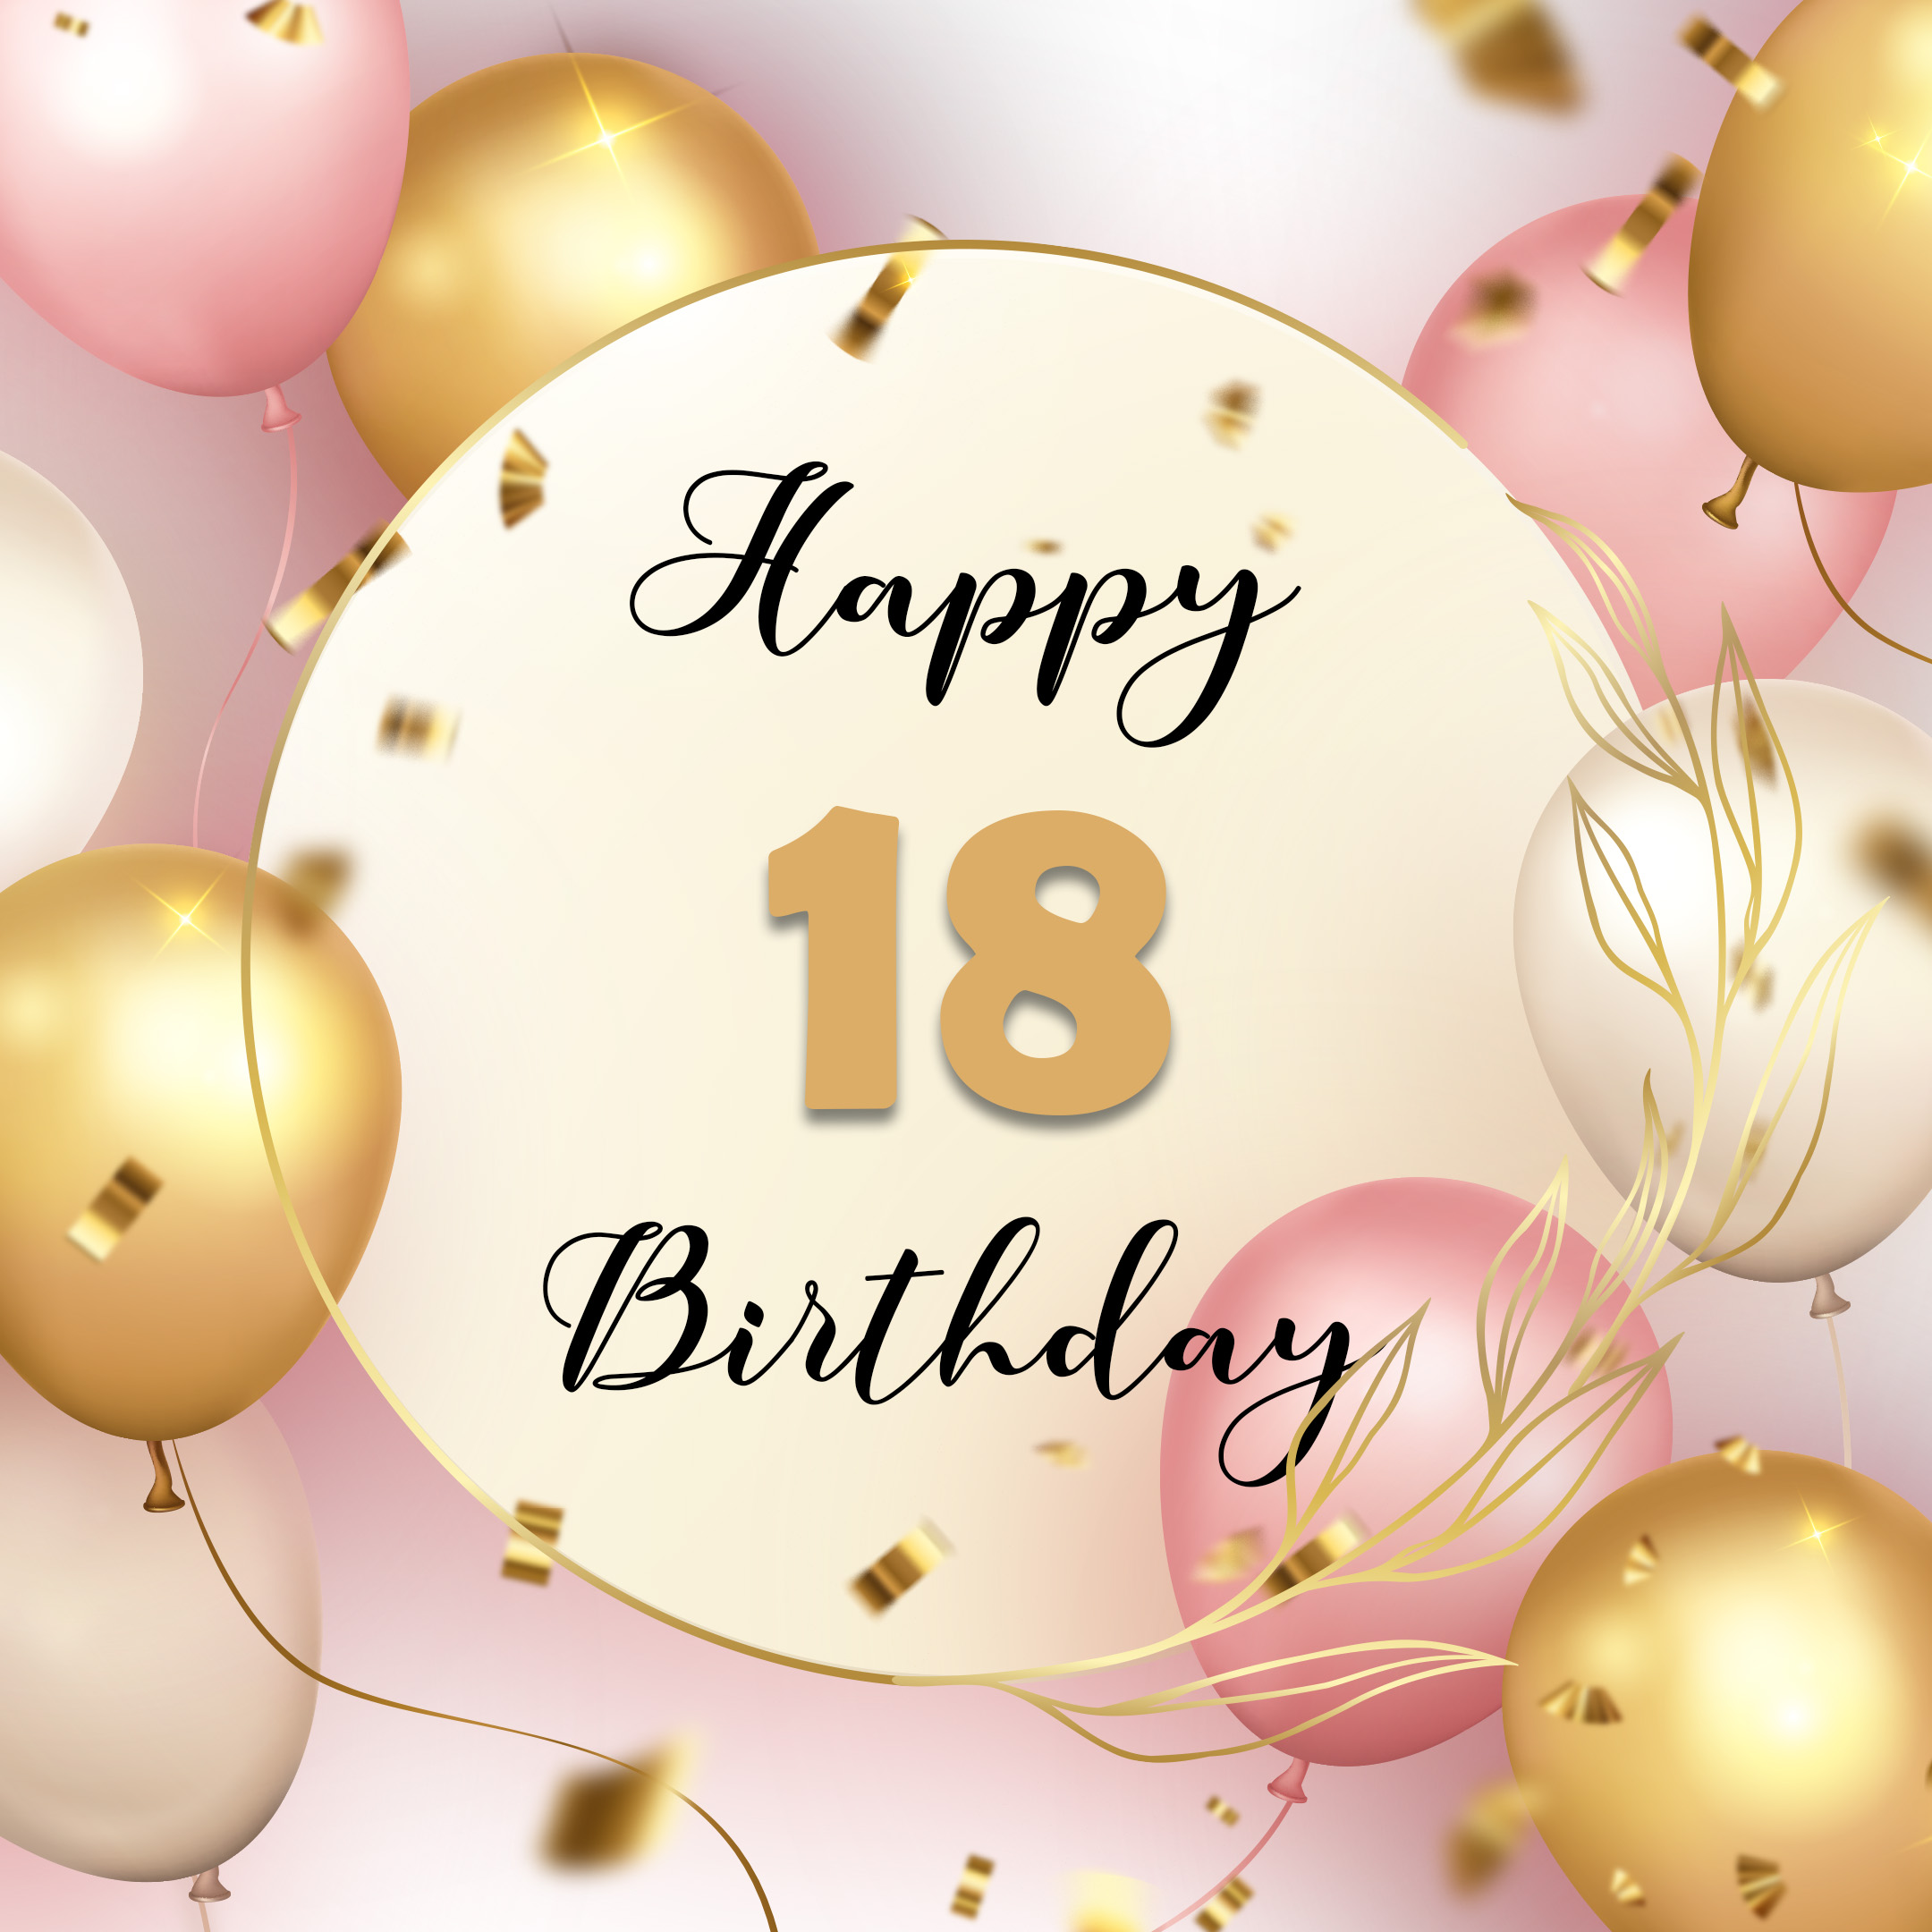 Free 18th Years Happy Birthday Image With Balloons - birthdayimg.com